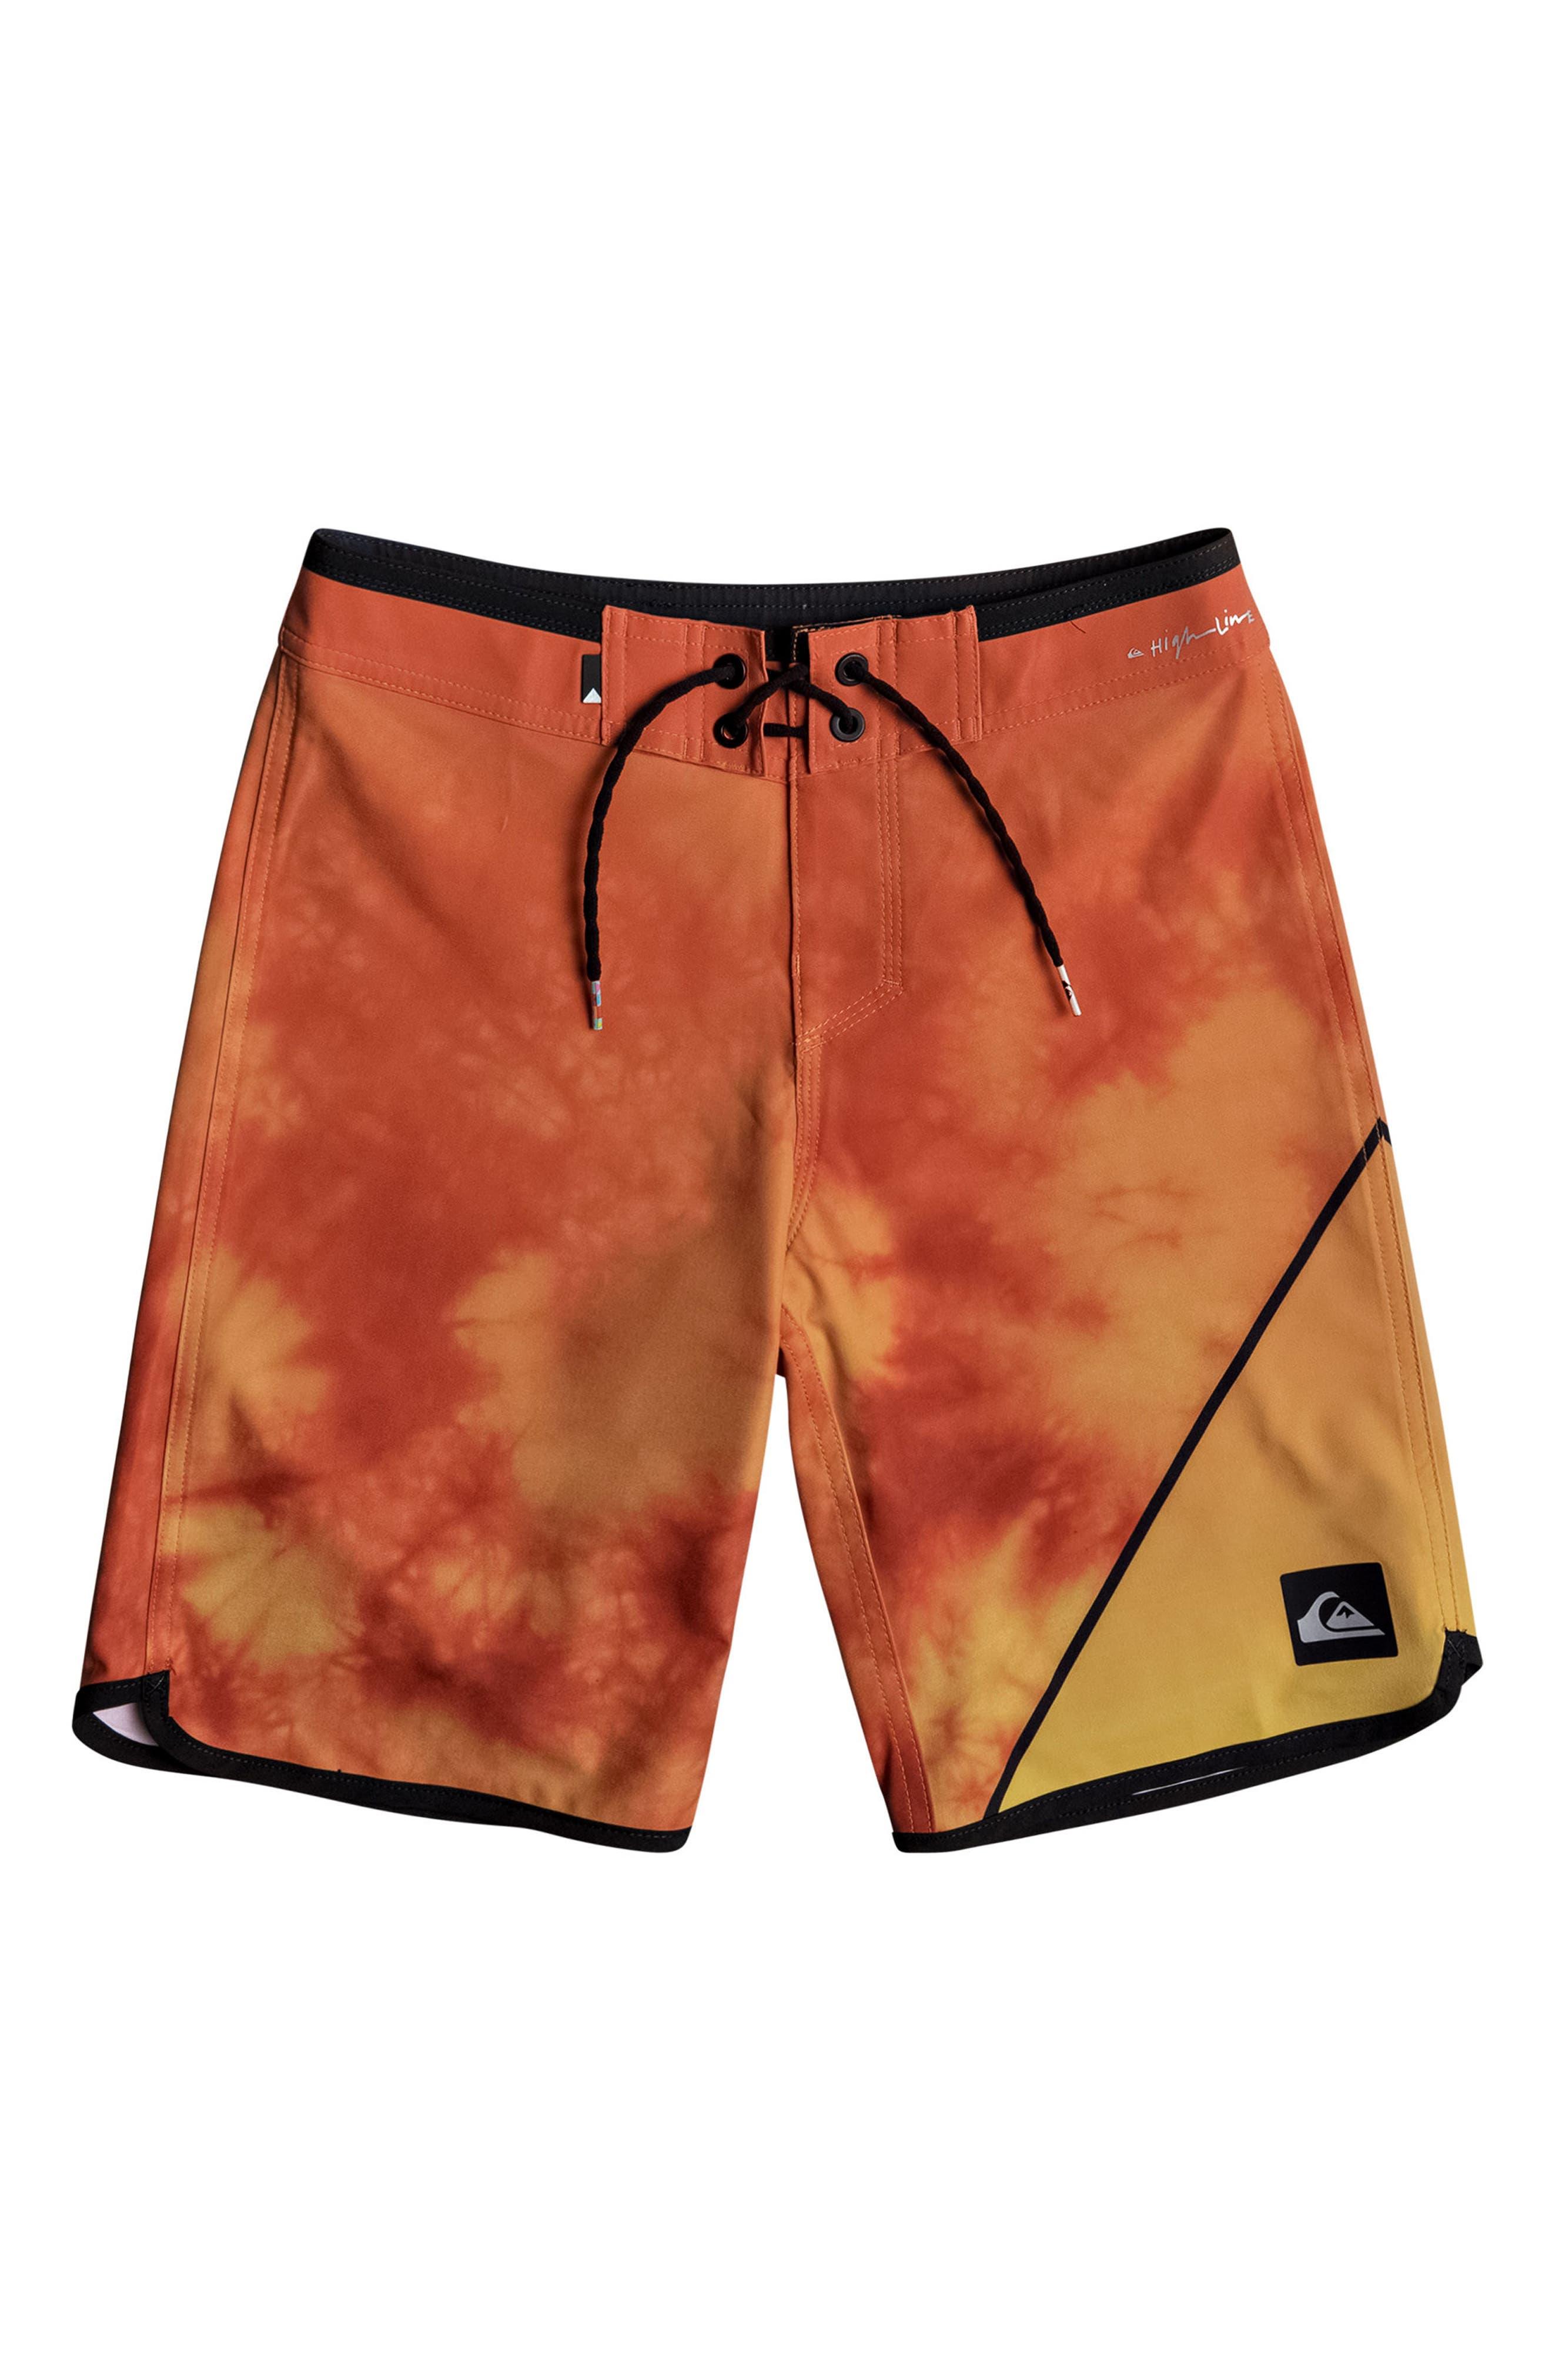 Main Image - Quiksilver New Wave Board Shorts (Big Boys)